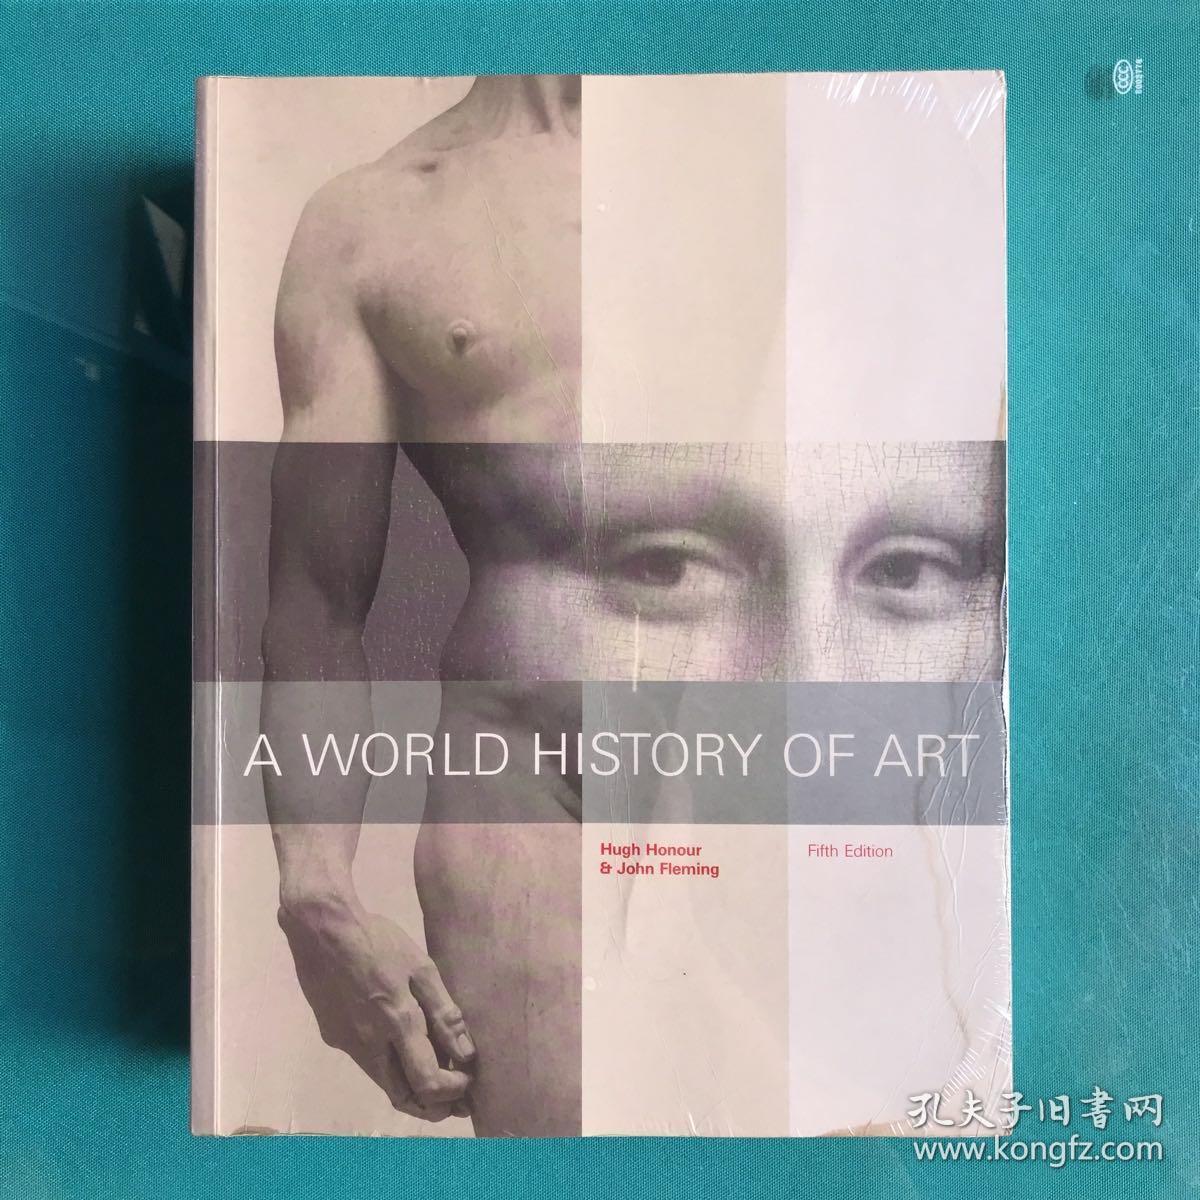 A WORLD HISTORY OF ART(大量插图 英文原版 大16开)(塑封9品,仅封面角有点如图水渍,内完好)